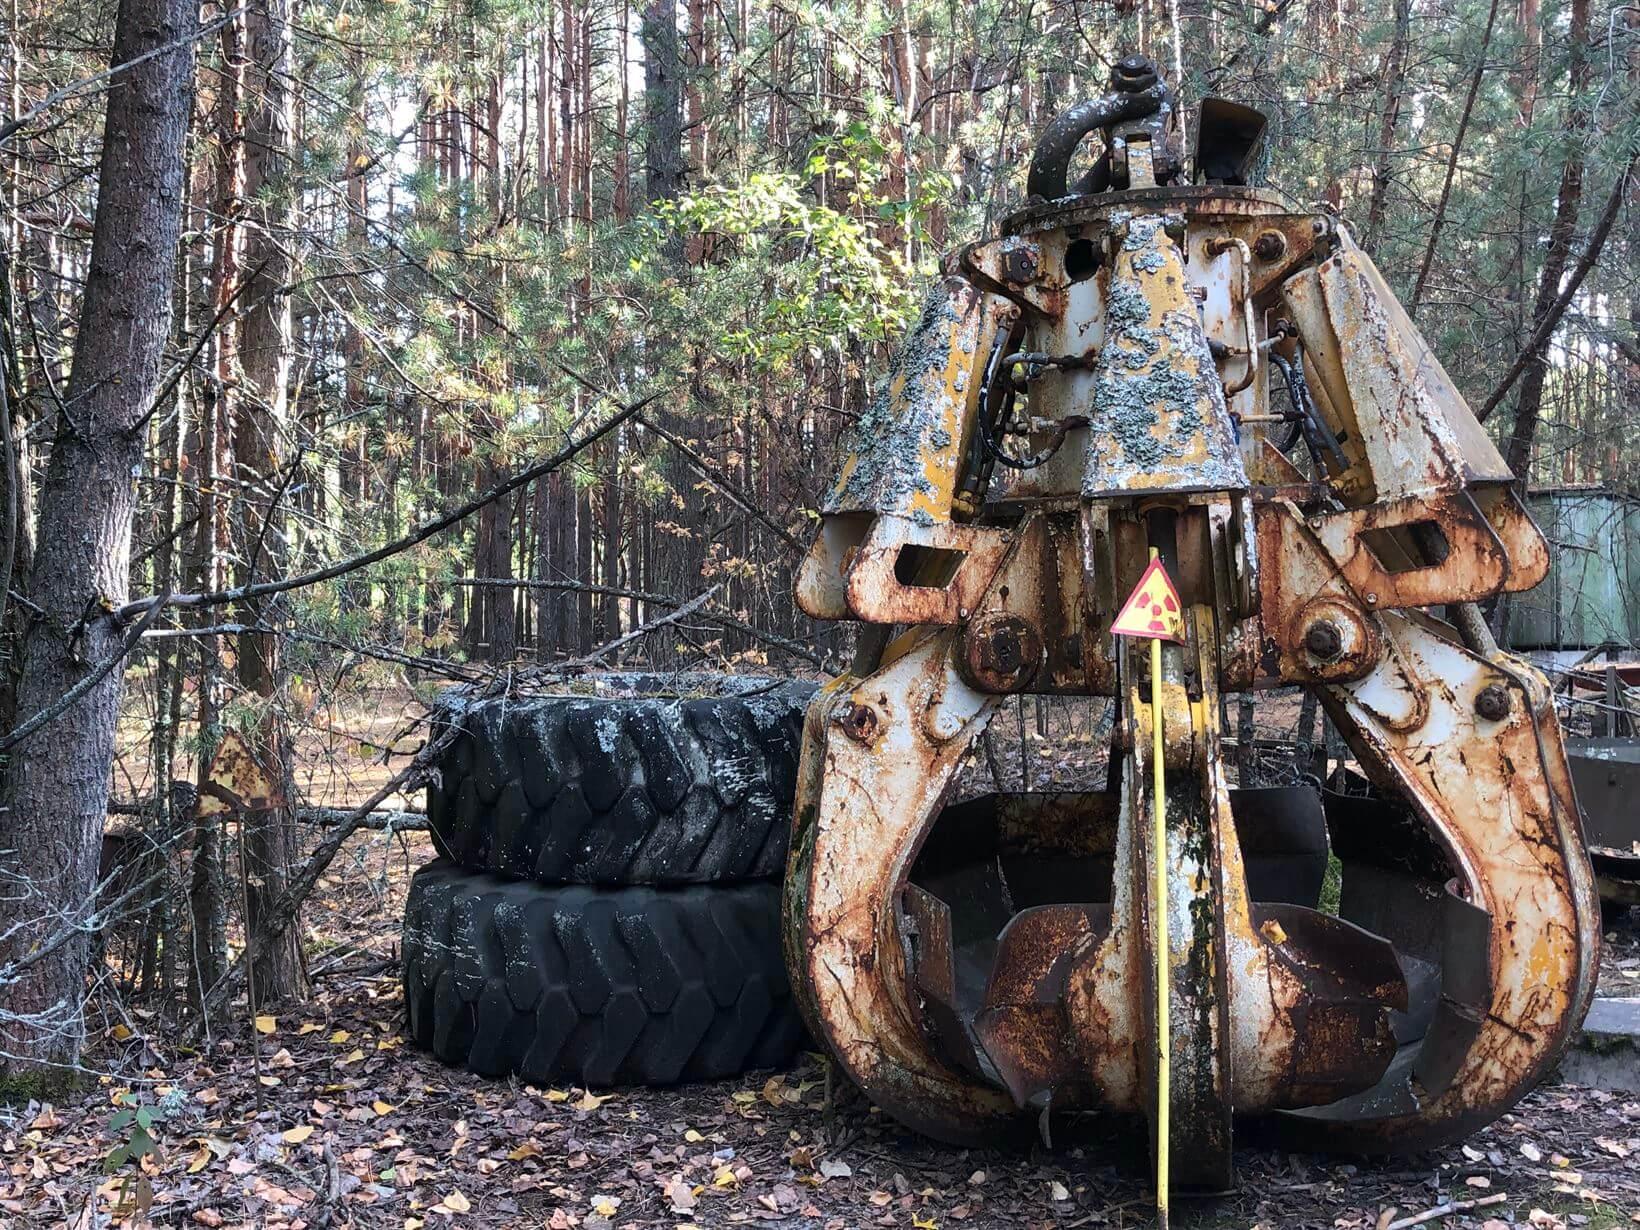 equipamentos chernobyl